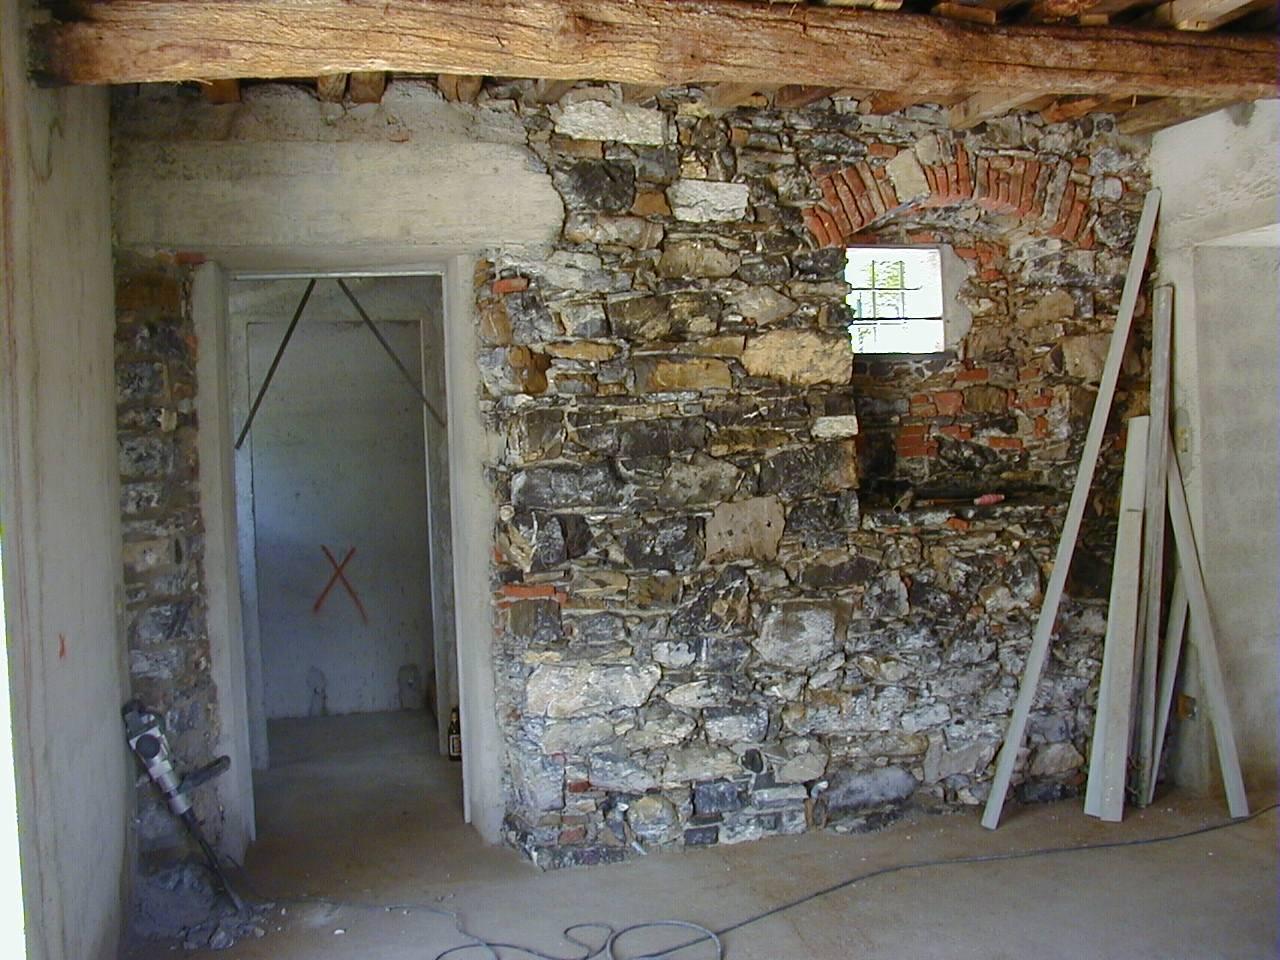 Pietre Bianca Per Interni pareti in pietra a vista sbiancata. per un rustico